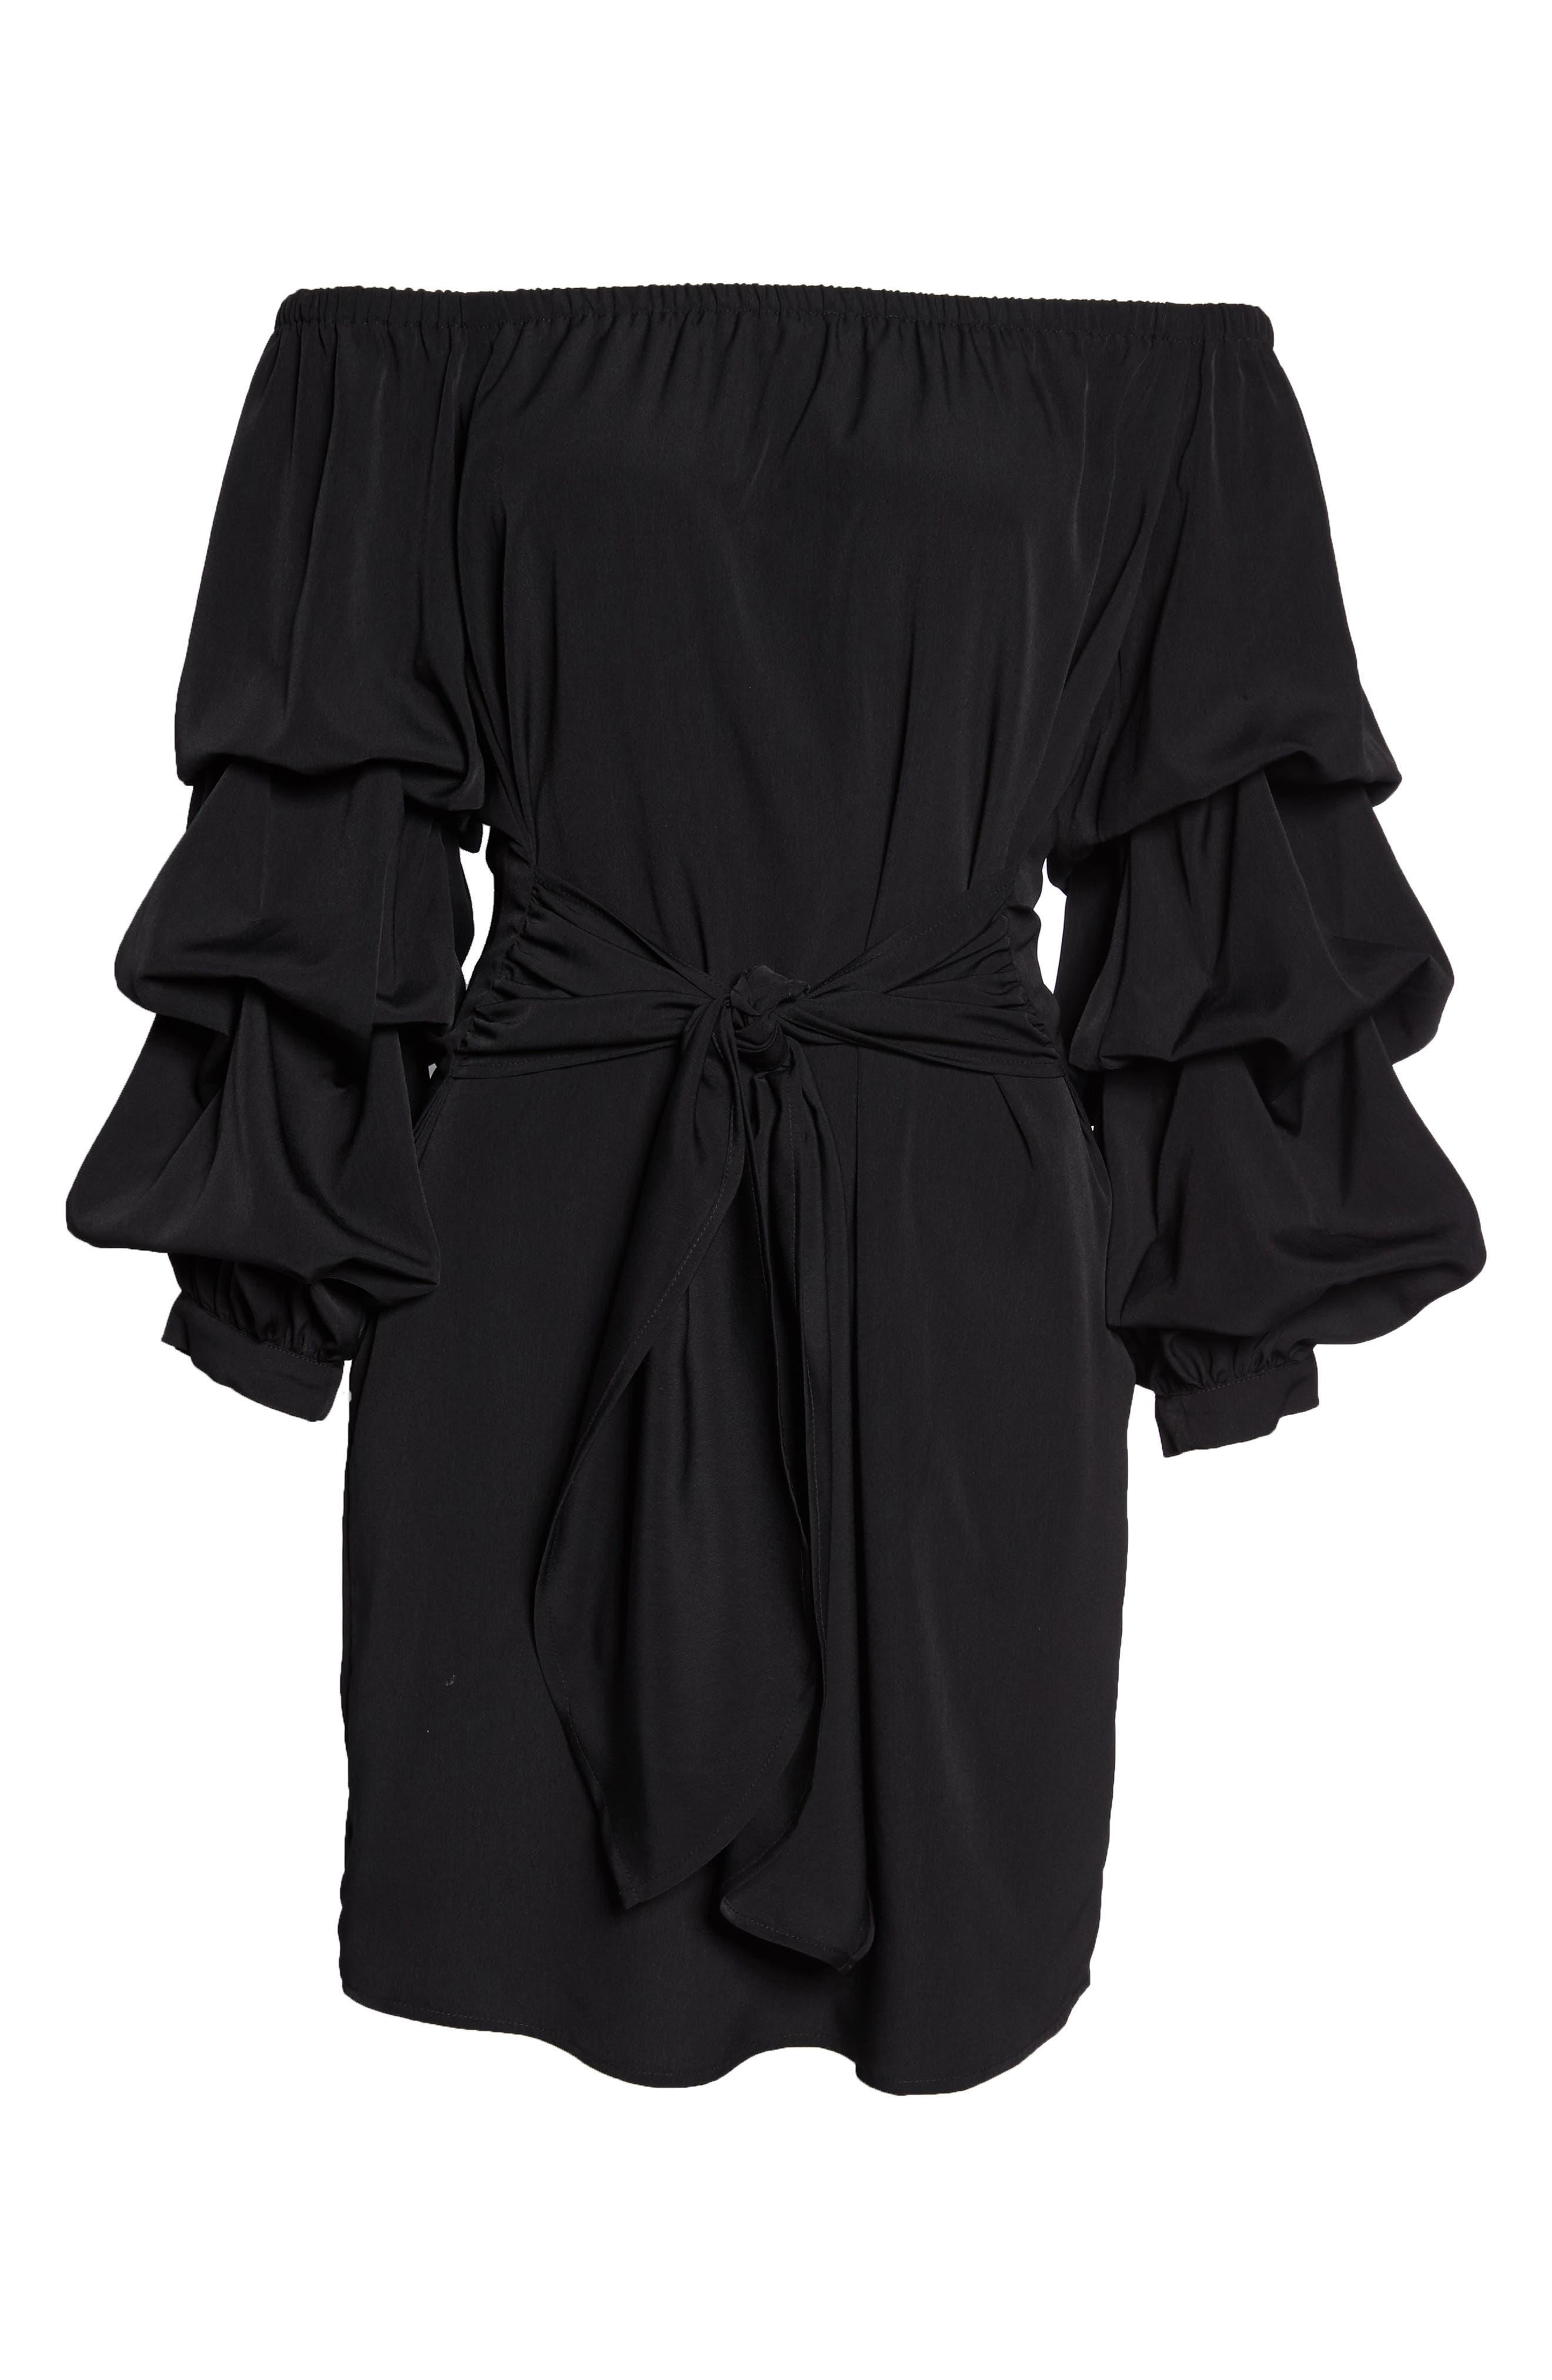 Off the Shoulder Tiered Sleeve Dress,                             Alternate thumbnail 6, color,                             Black